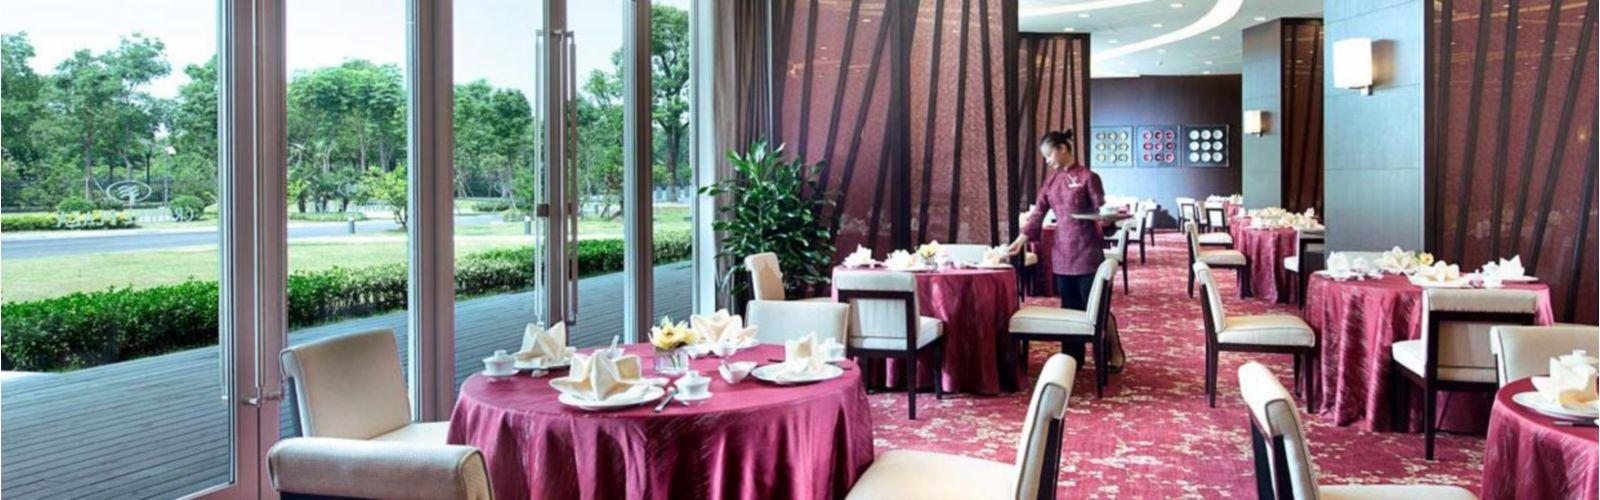 Restaurant photo